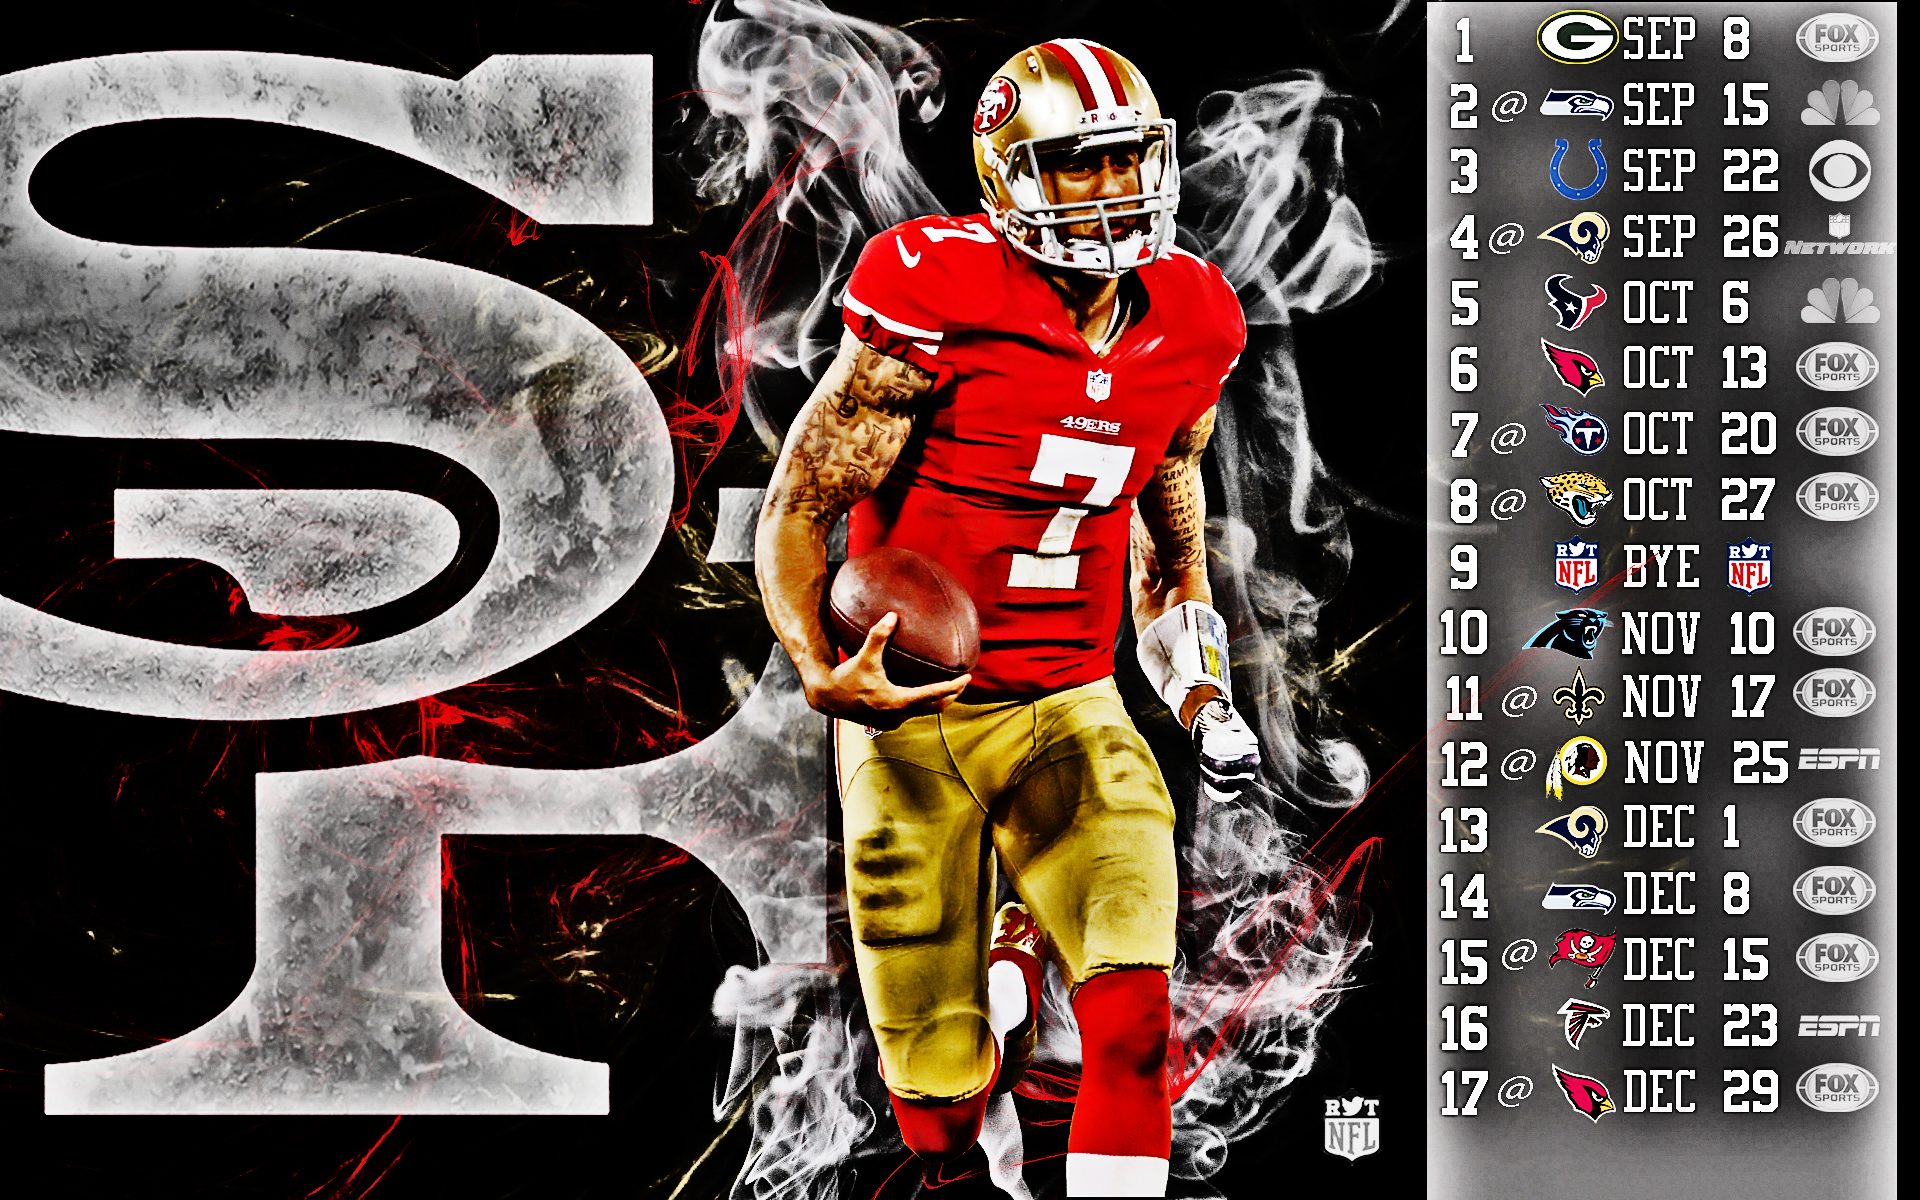 2013 nfl schedule wallpapers hdr sports - 2015 49ers schedule wallpaper ...